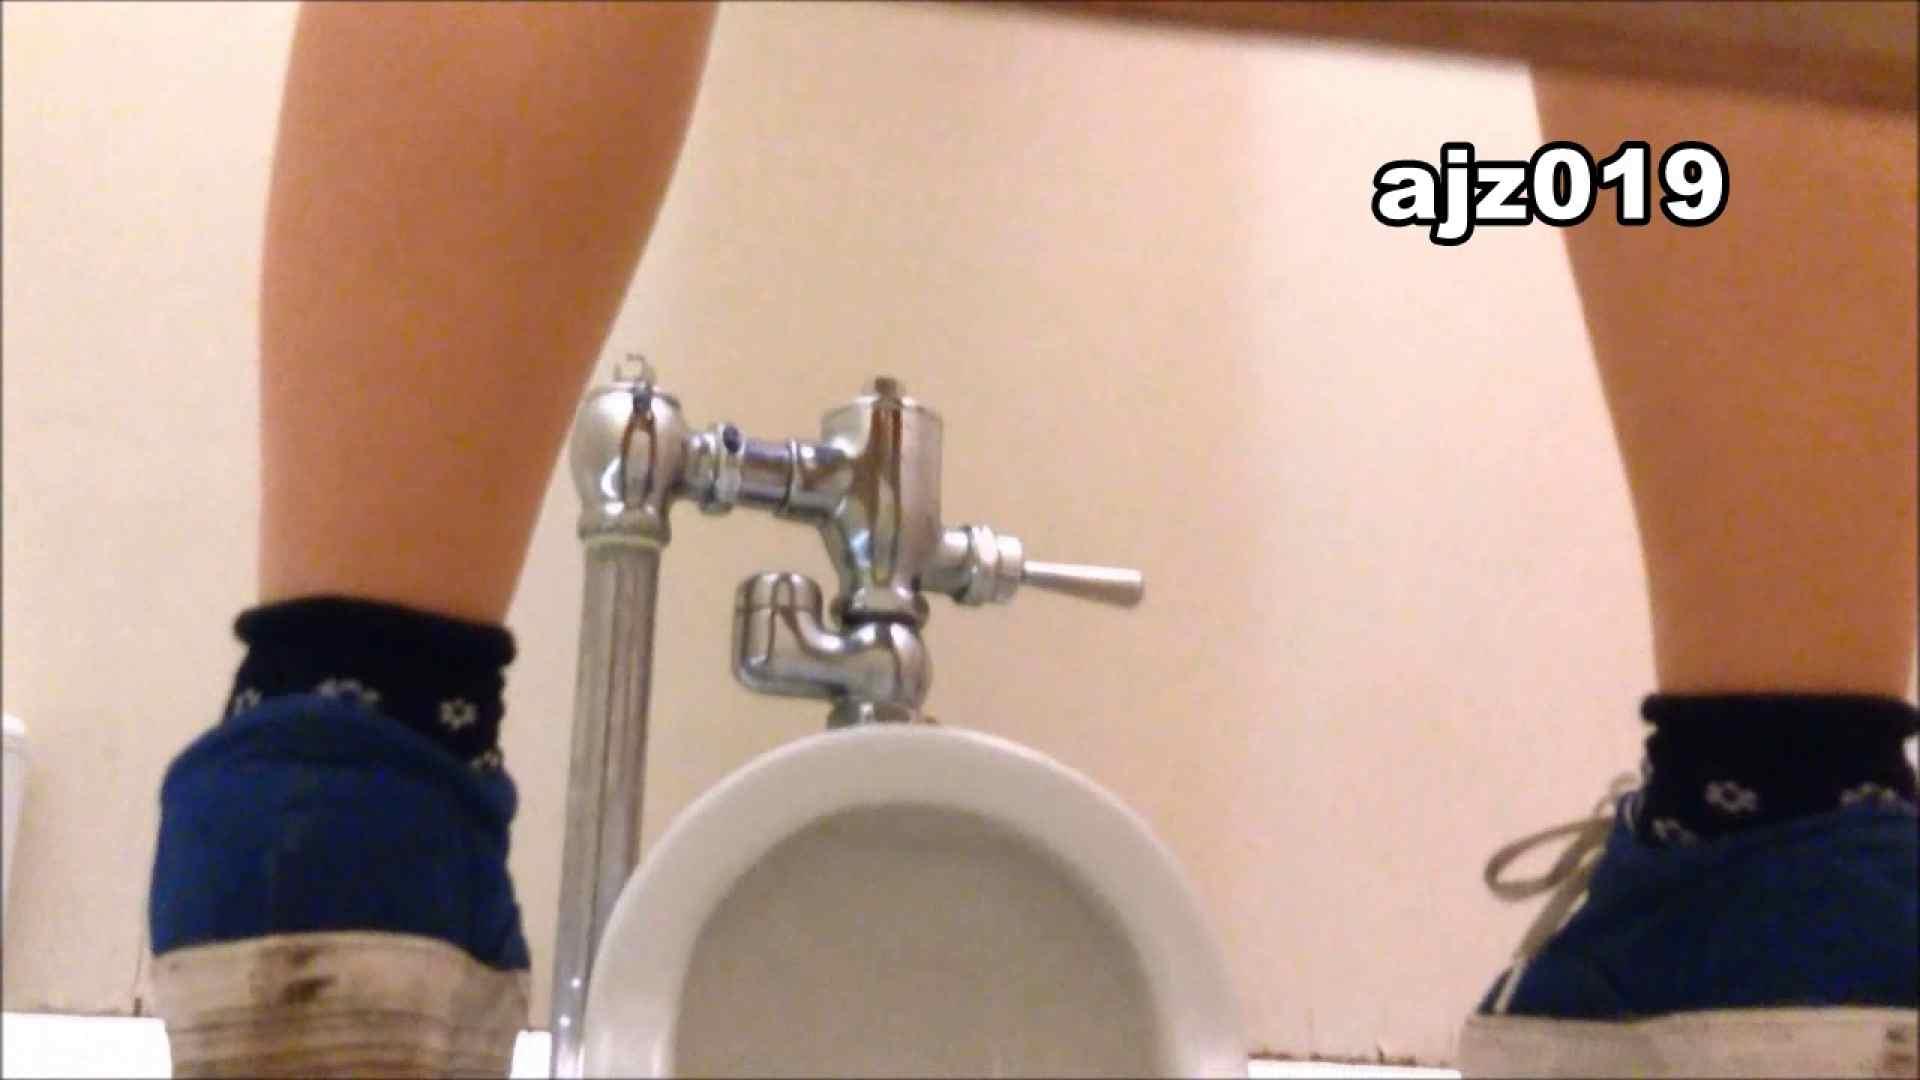 某有名大学女性洗面所 vol.19 排泄 | 和式でハメ撮り  84pic 67